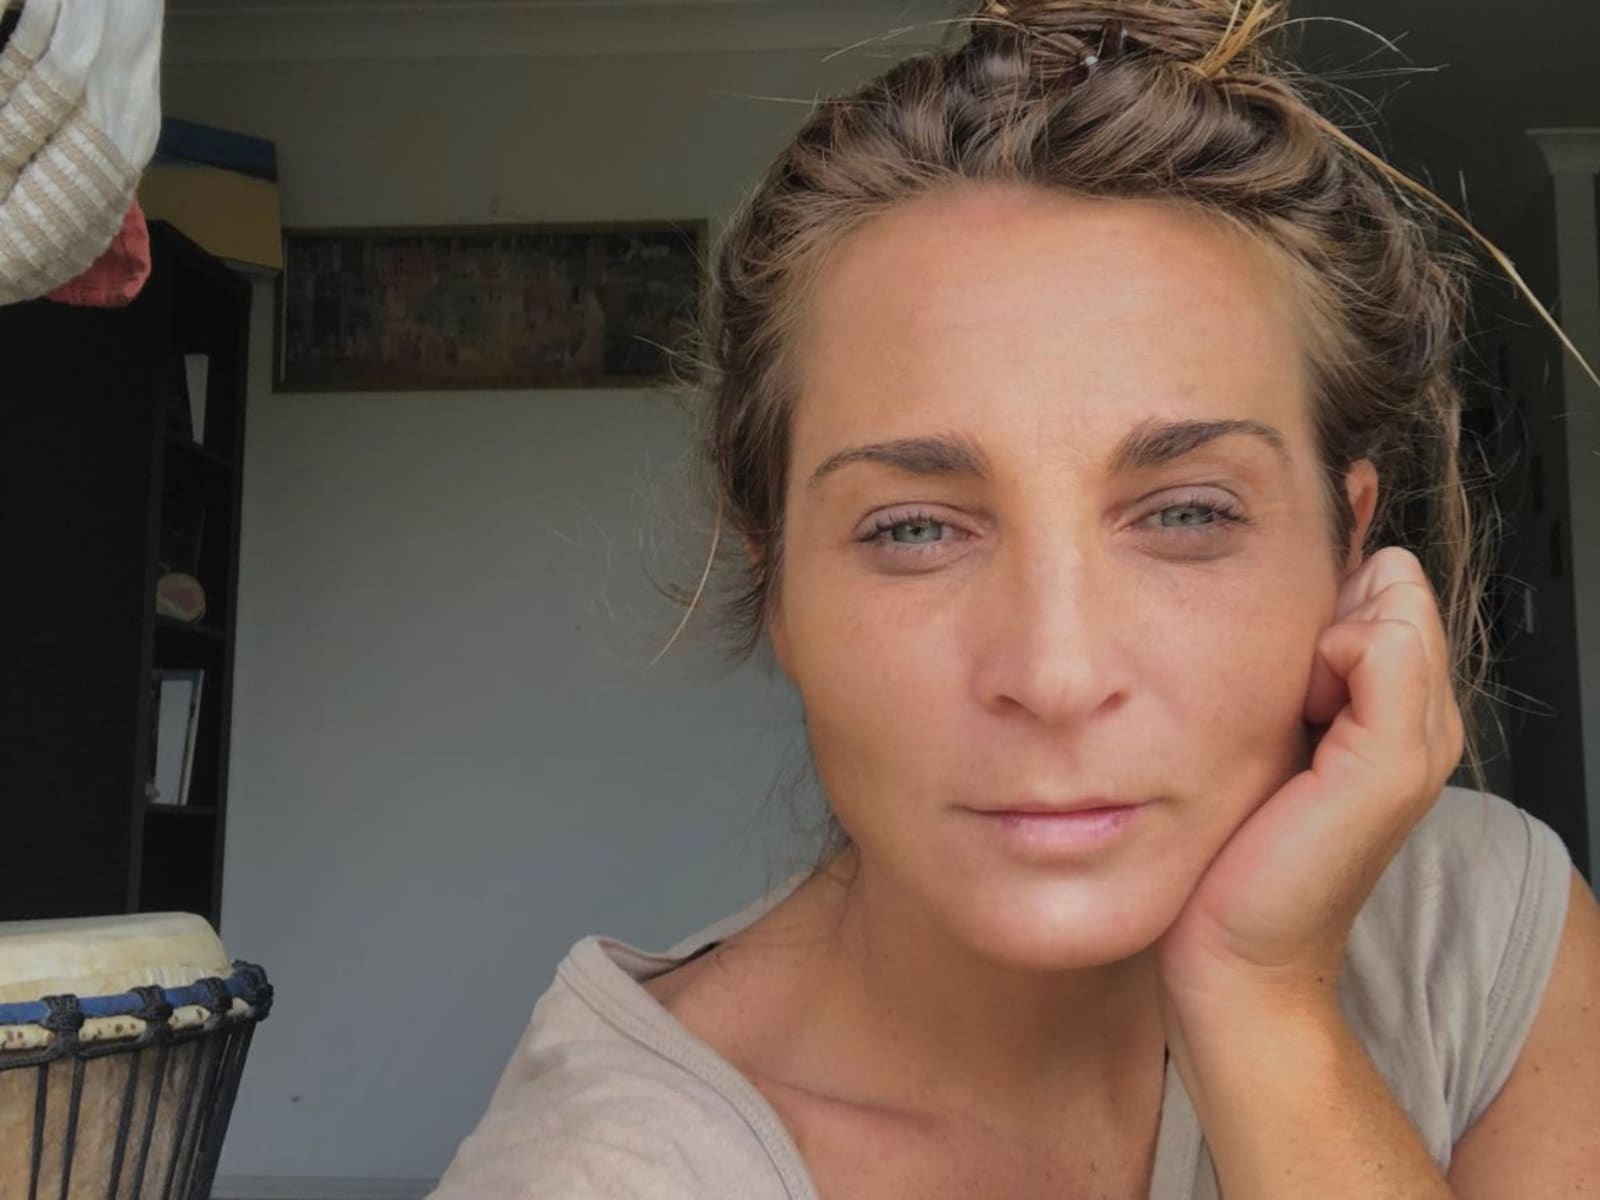 Francesca from Gold Coast, Queensland, Australia